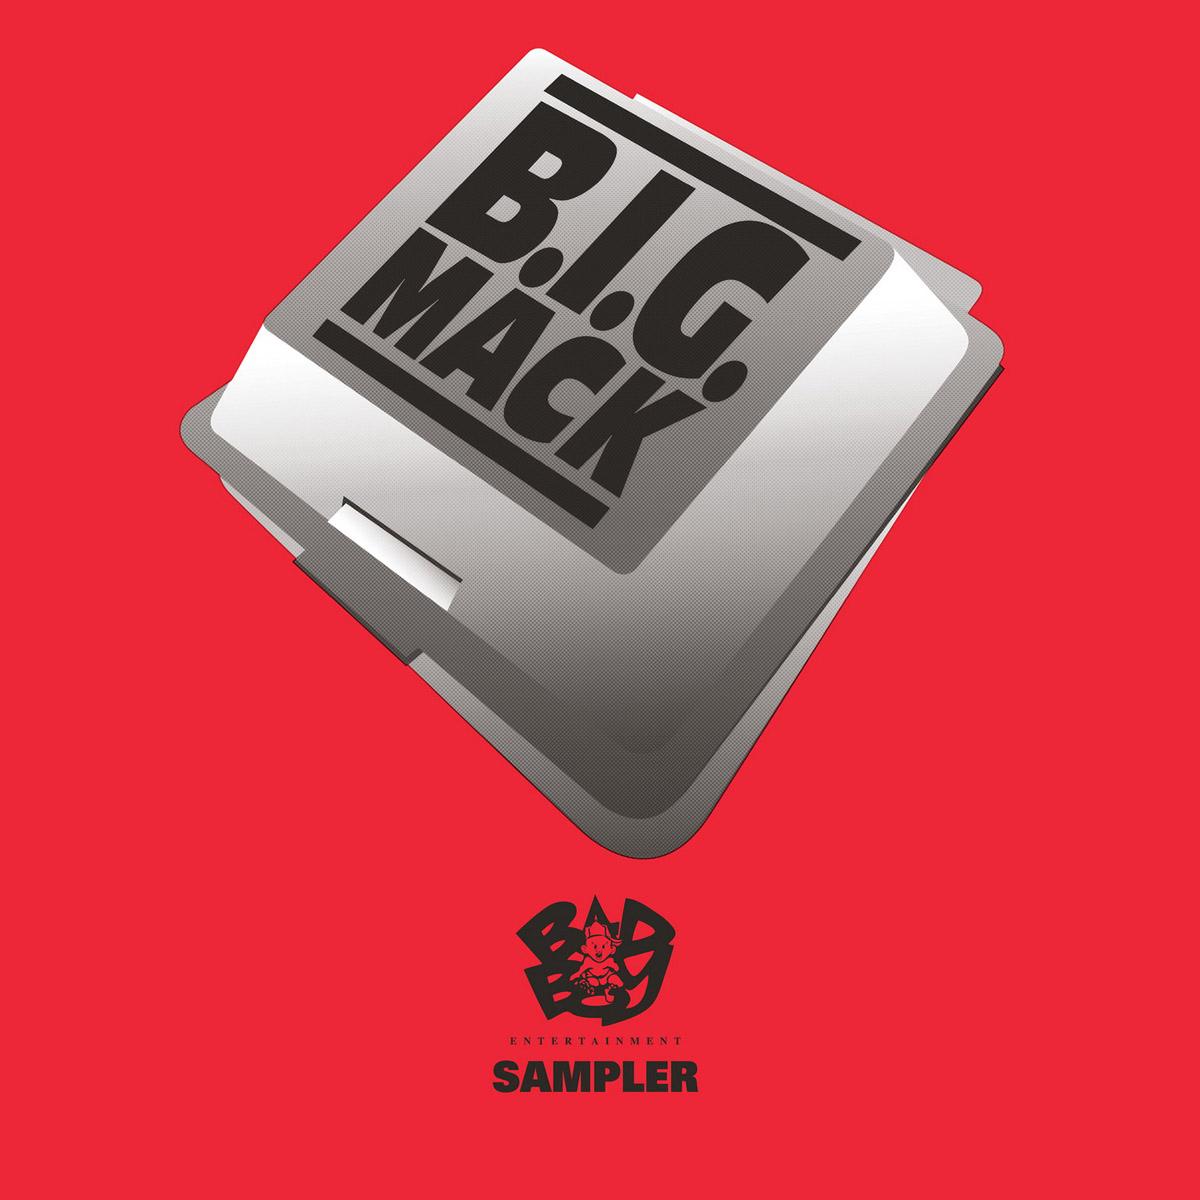 Грег Мак,The Notorious B.I.G. Craig Mack, Notorious B.I.G. The B.I.G. Mack (LP + Audio MC) цена